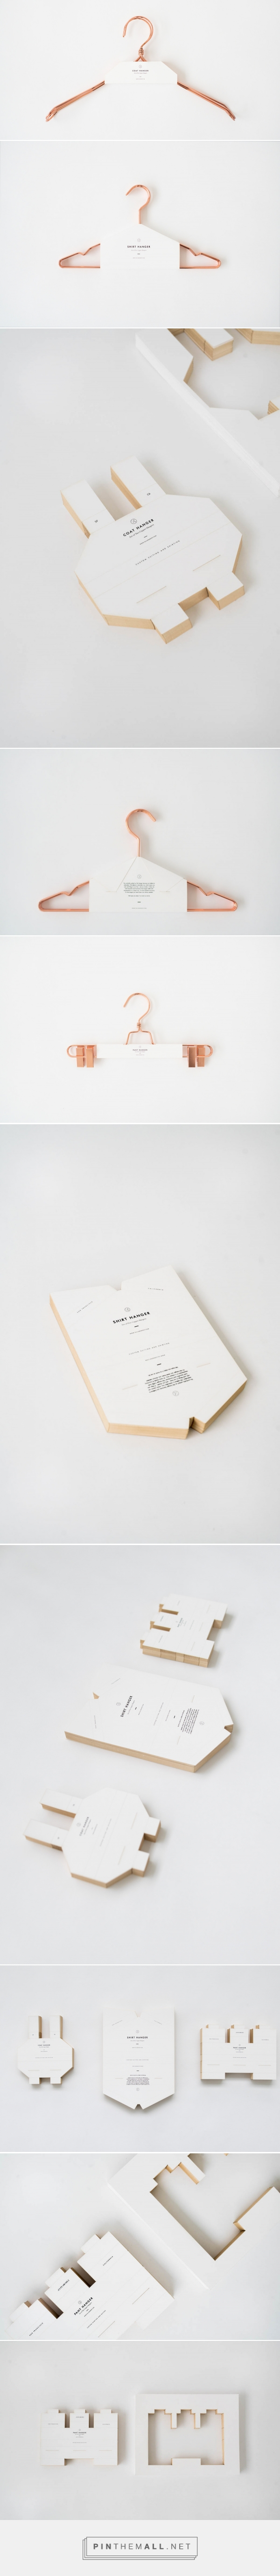 Tailors' Keep Hangers — The Dieline - Branding & Packaging Design - created via https://pinthemall.net